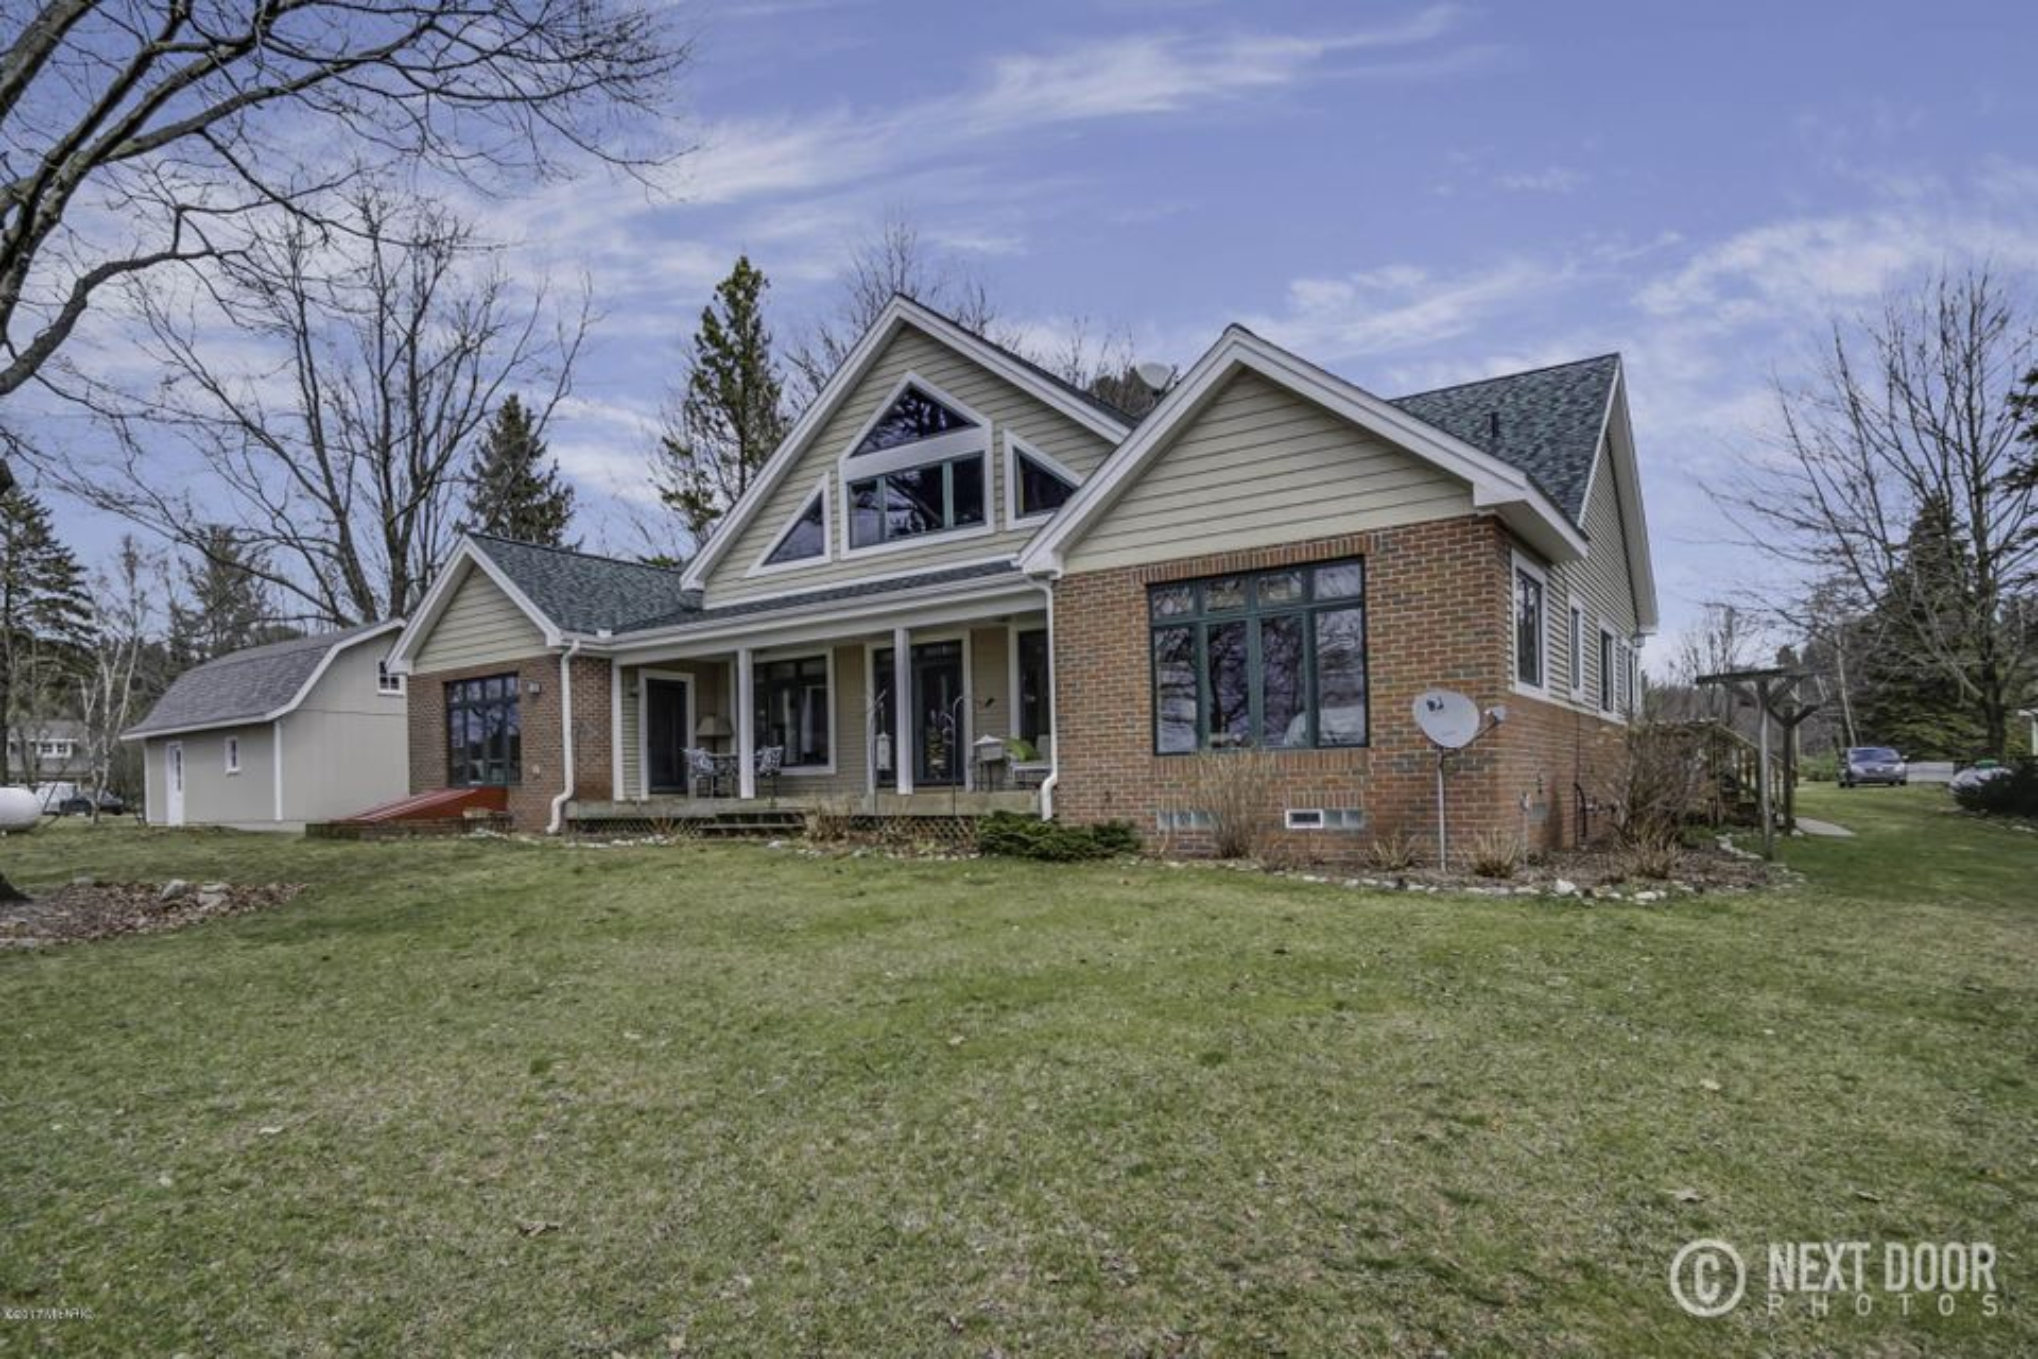 Single Family Home for Sale at 5475 Lakeshore Ludington, Michigan 49431 United States